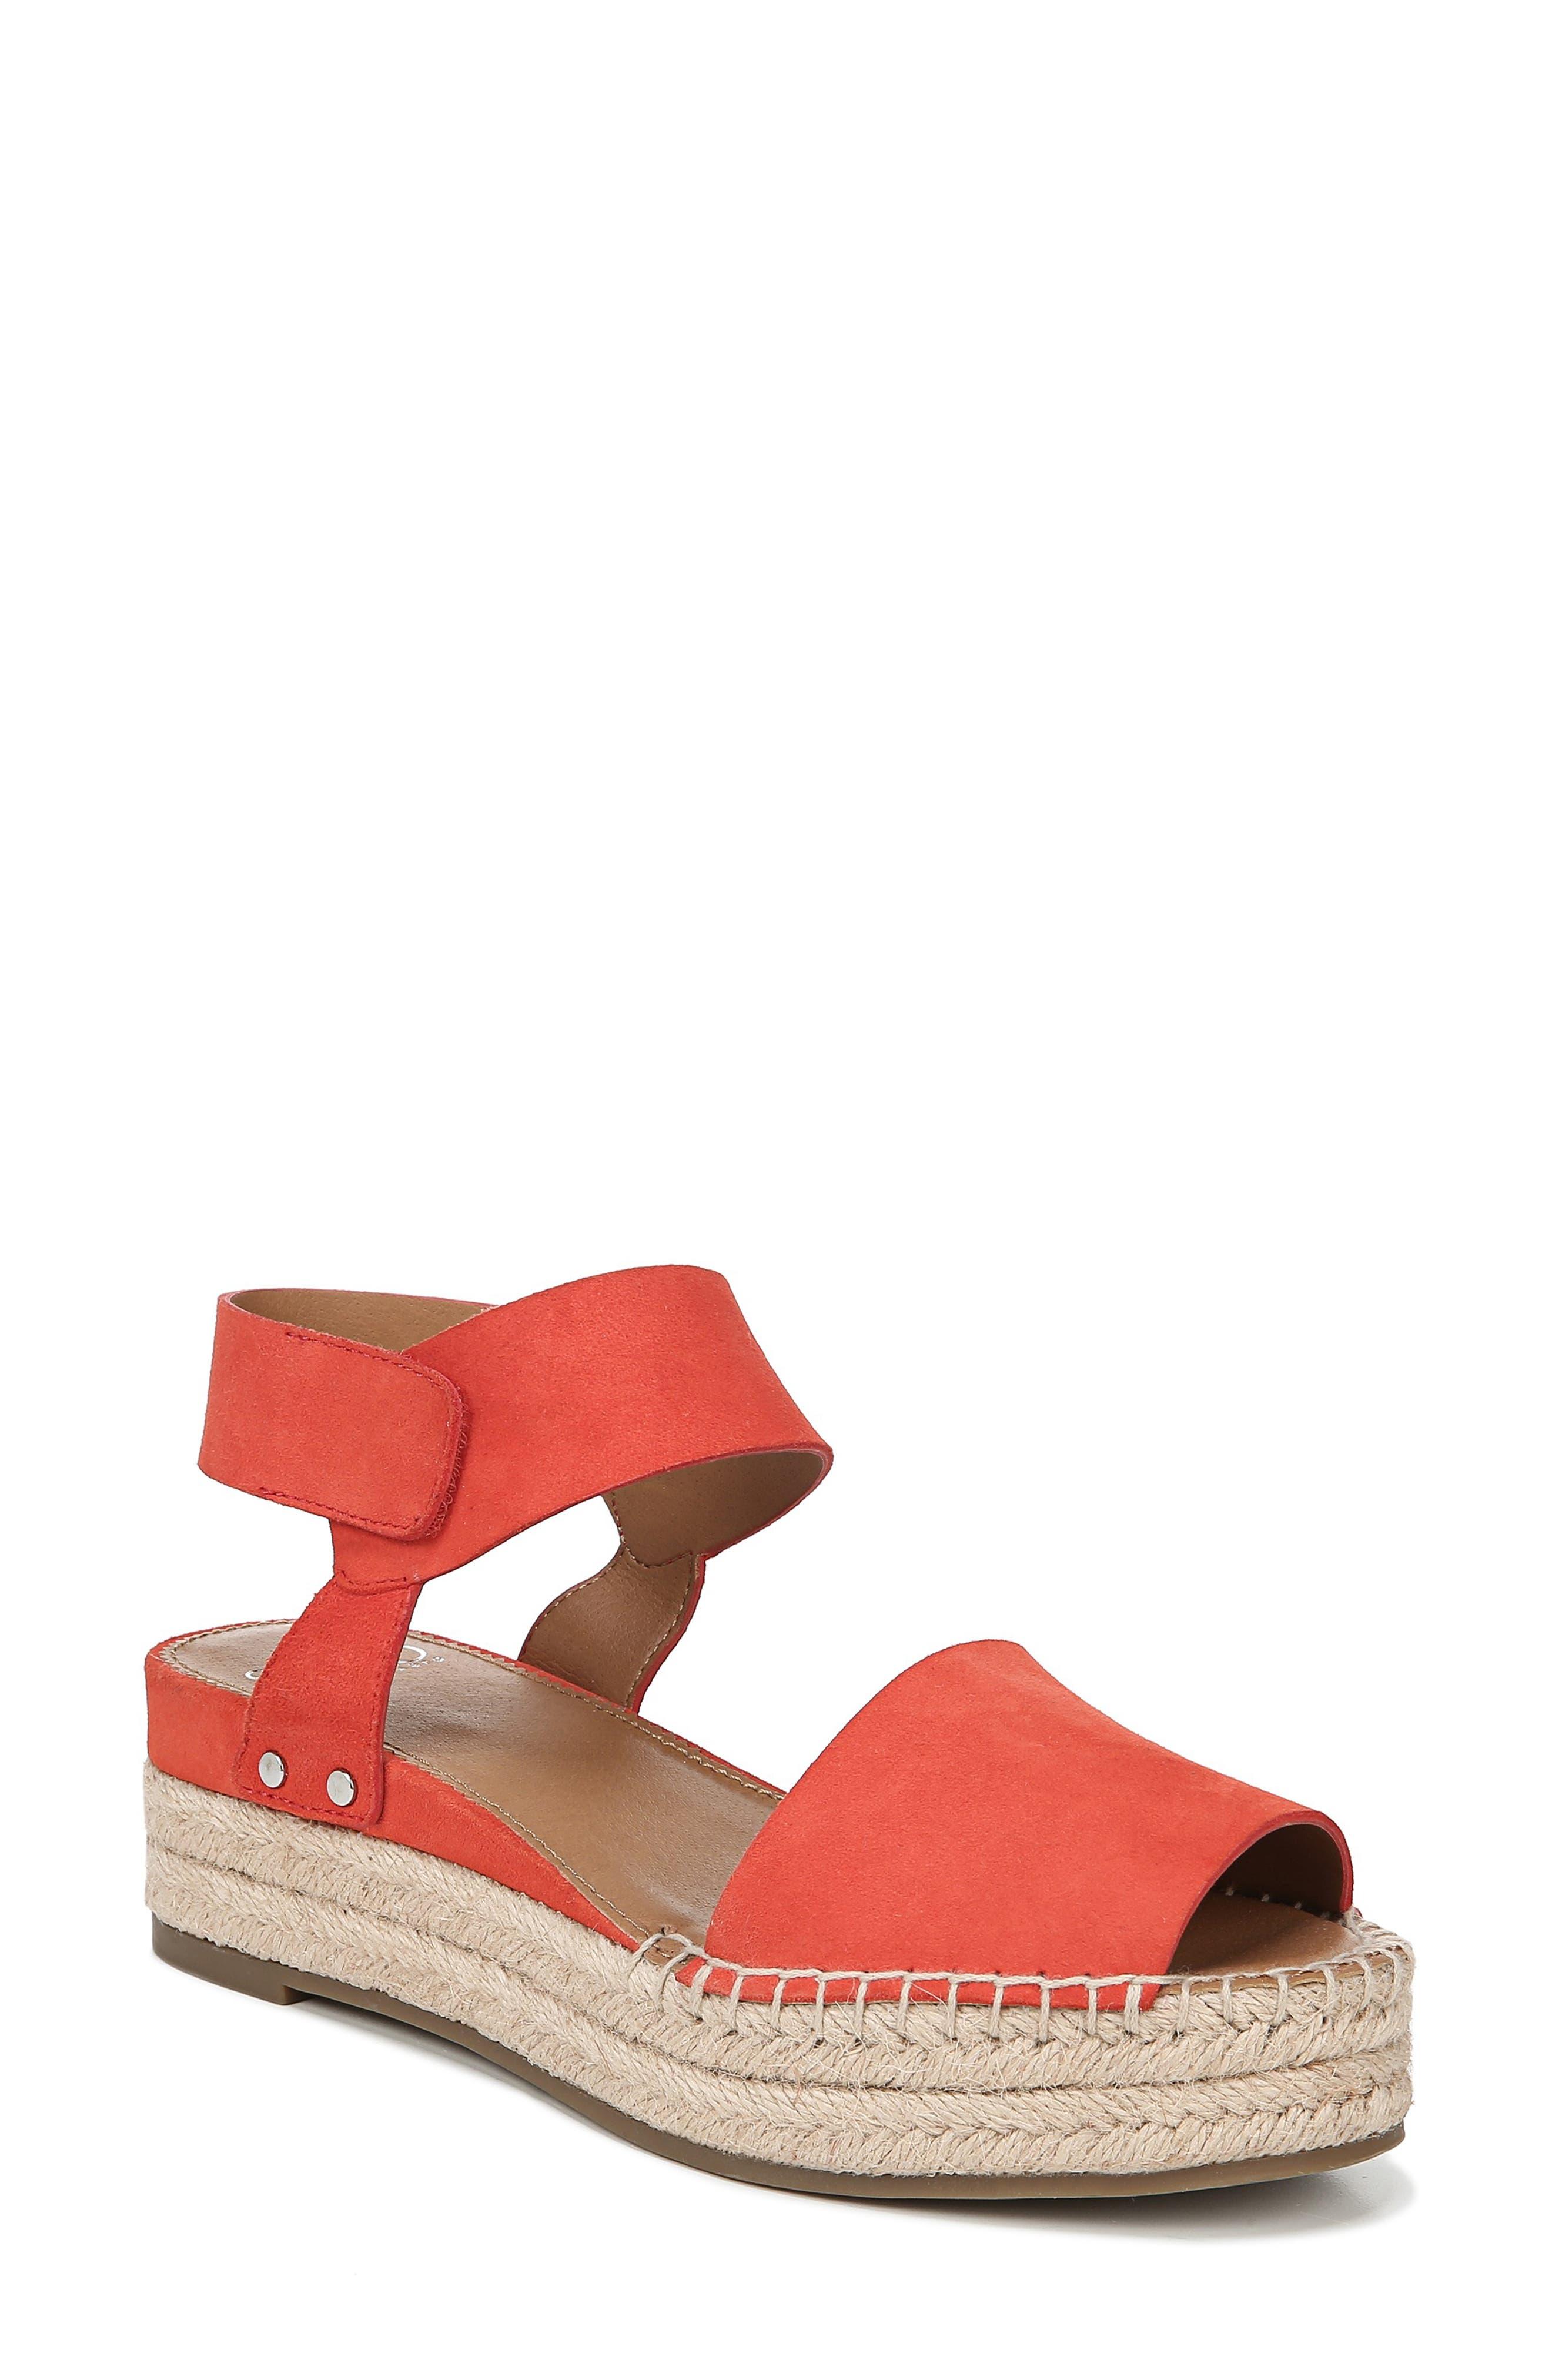 0dcfab2c9c67 franco sarto sandals